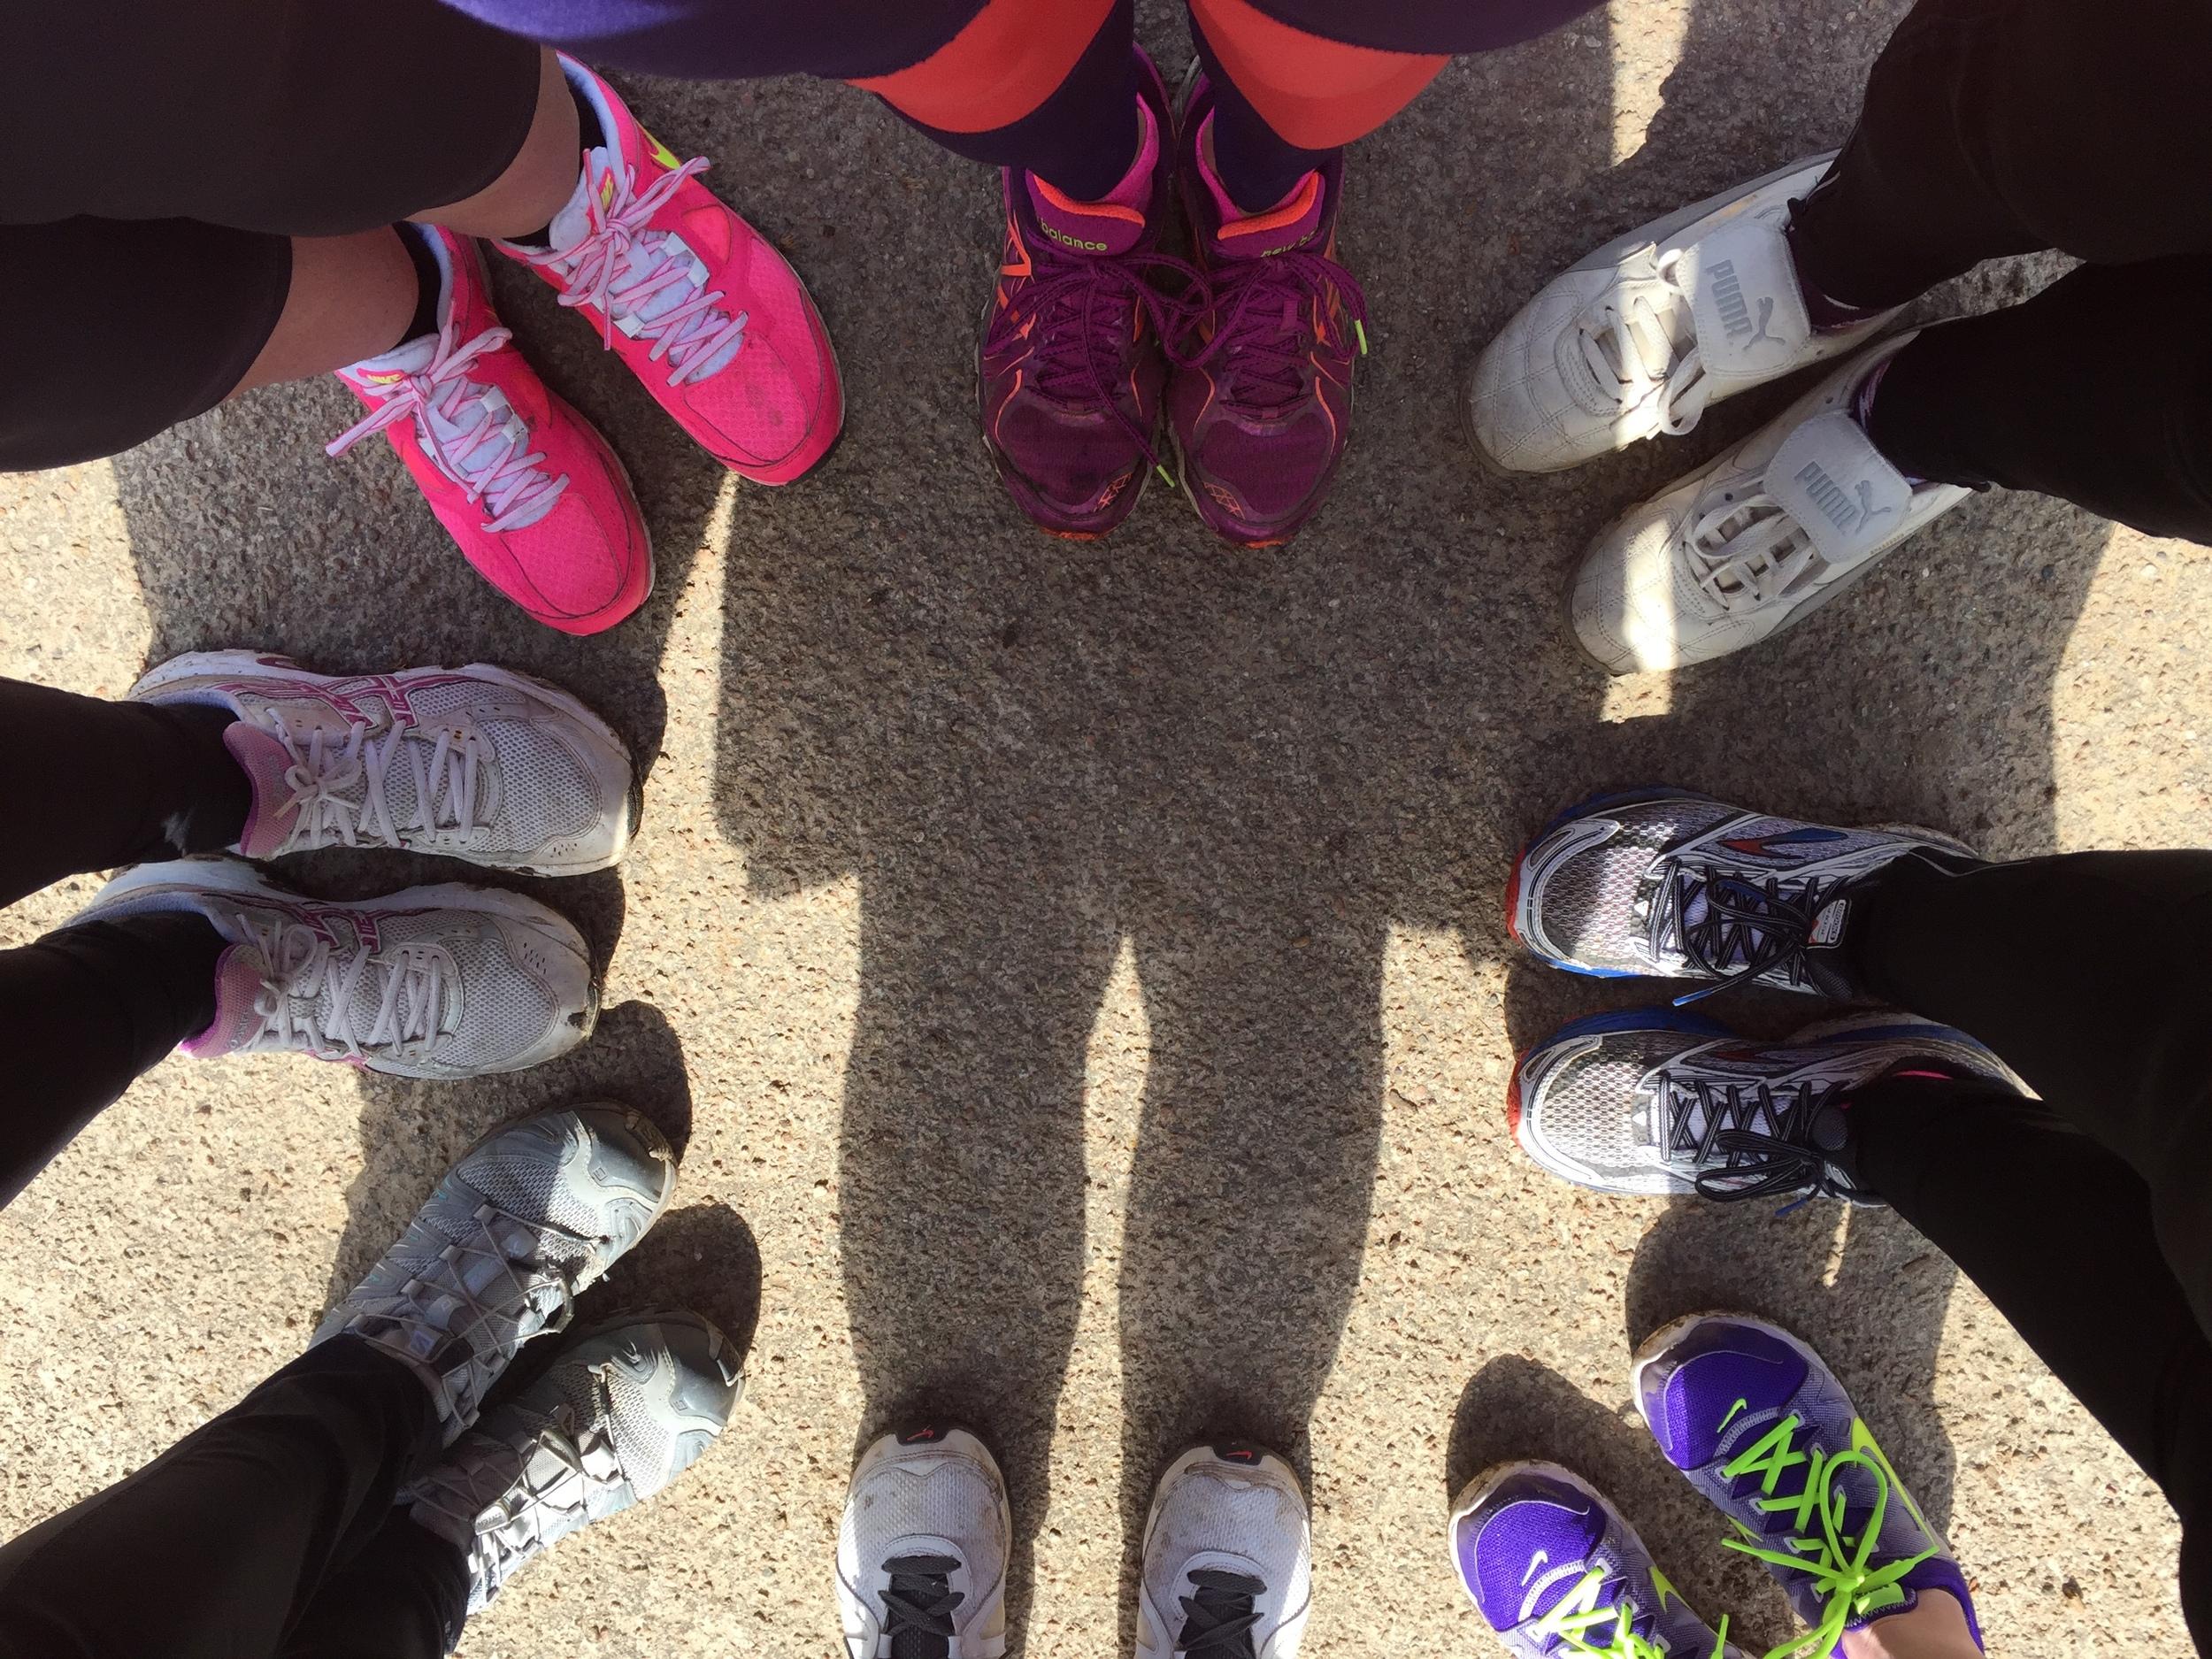 Small groups at Sevenoaks Ladies Joggers